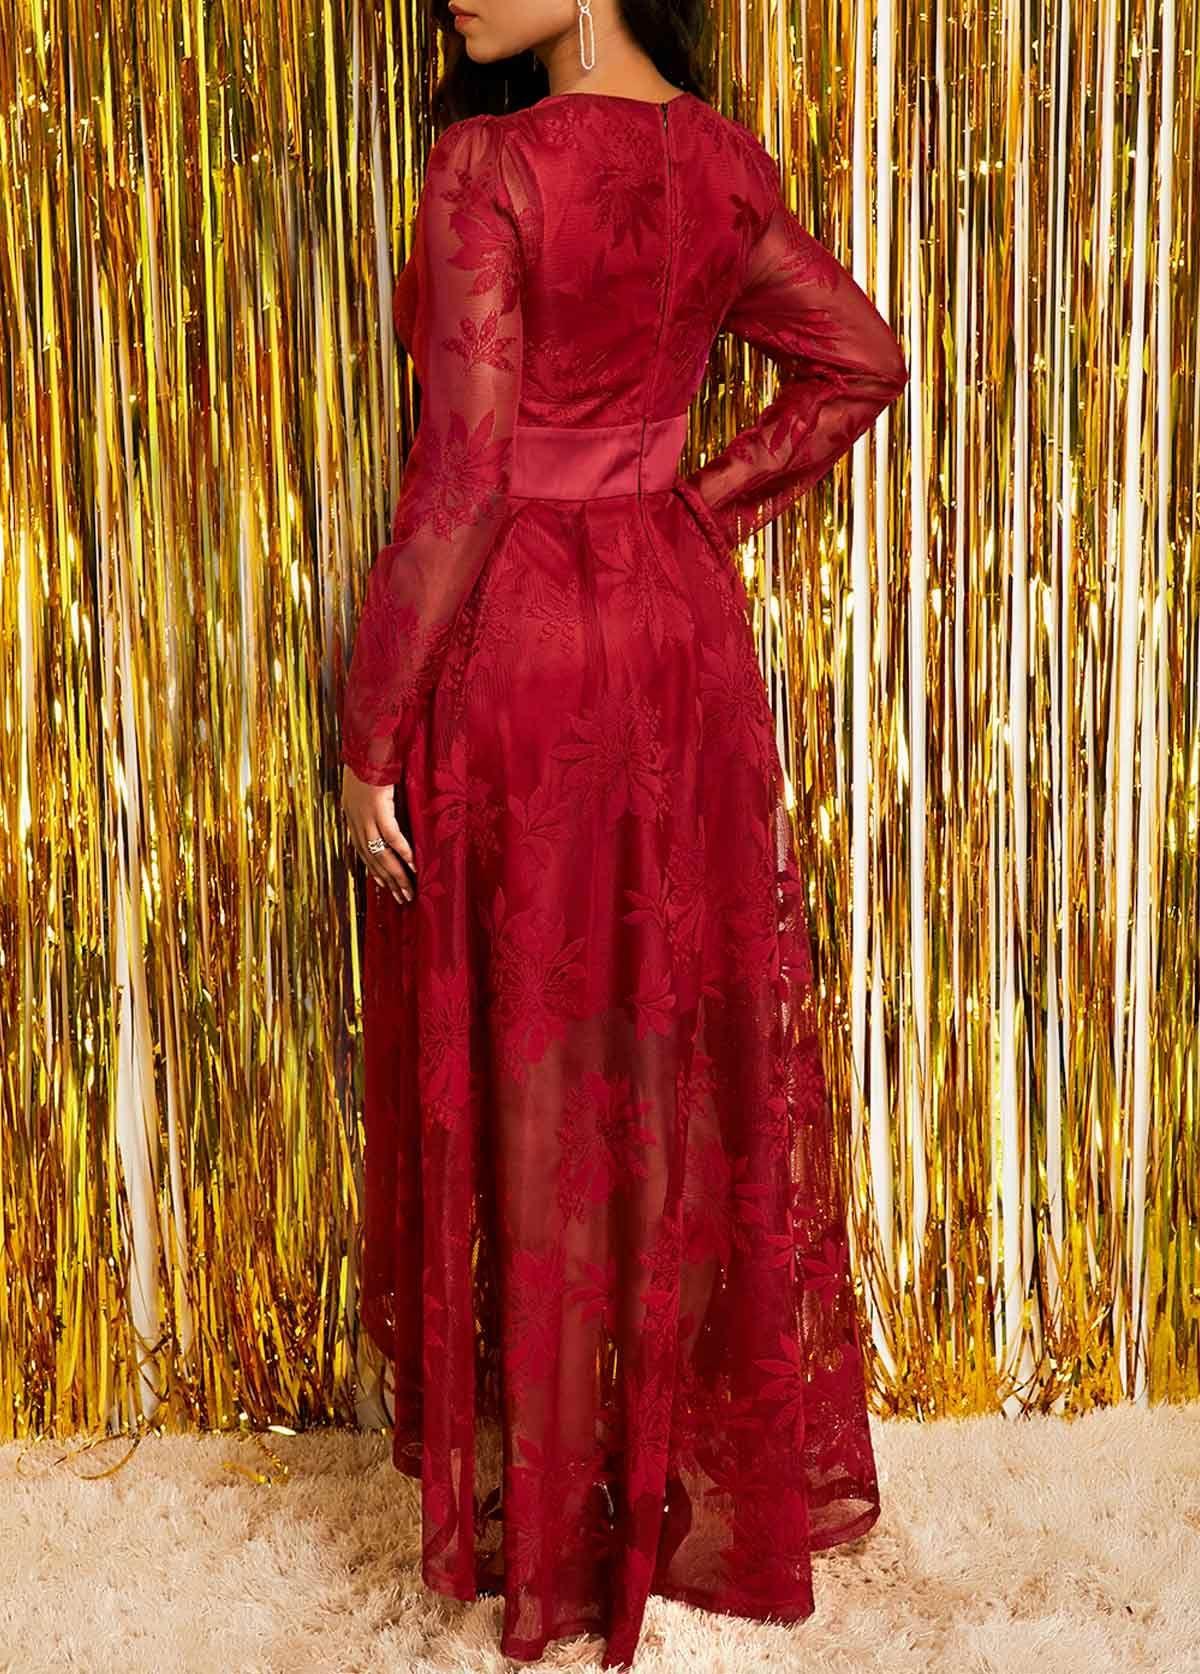 Band Waist Long Sleeve Wine Red Lace Dress Rotita Com Usd 32 52 Vestidos Azules Vestidos Largos Ropa De Oficina